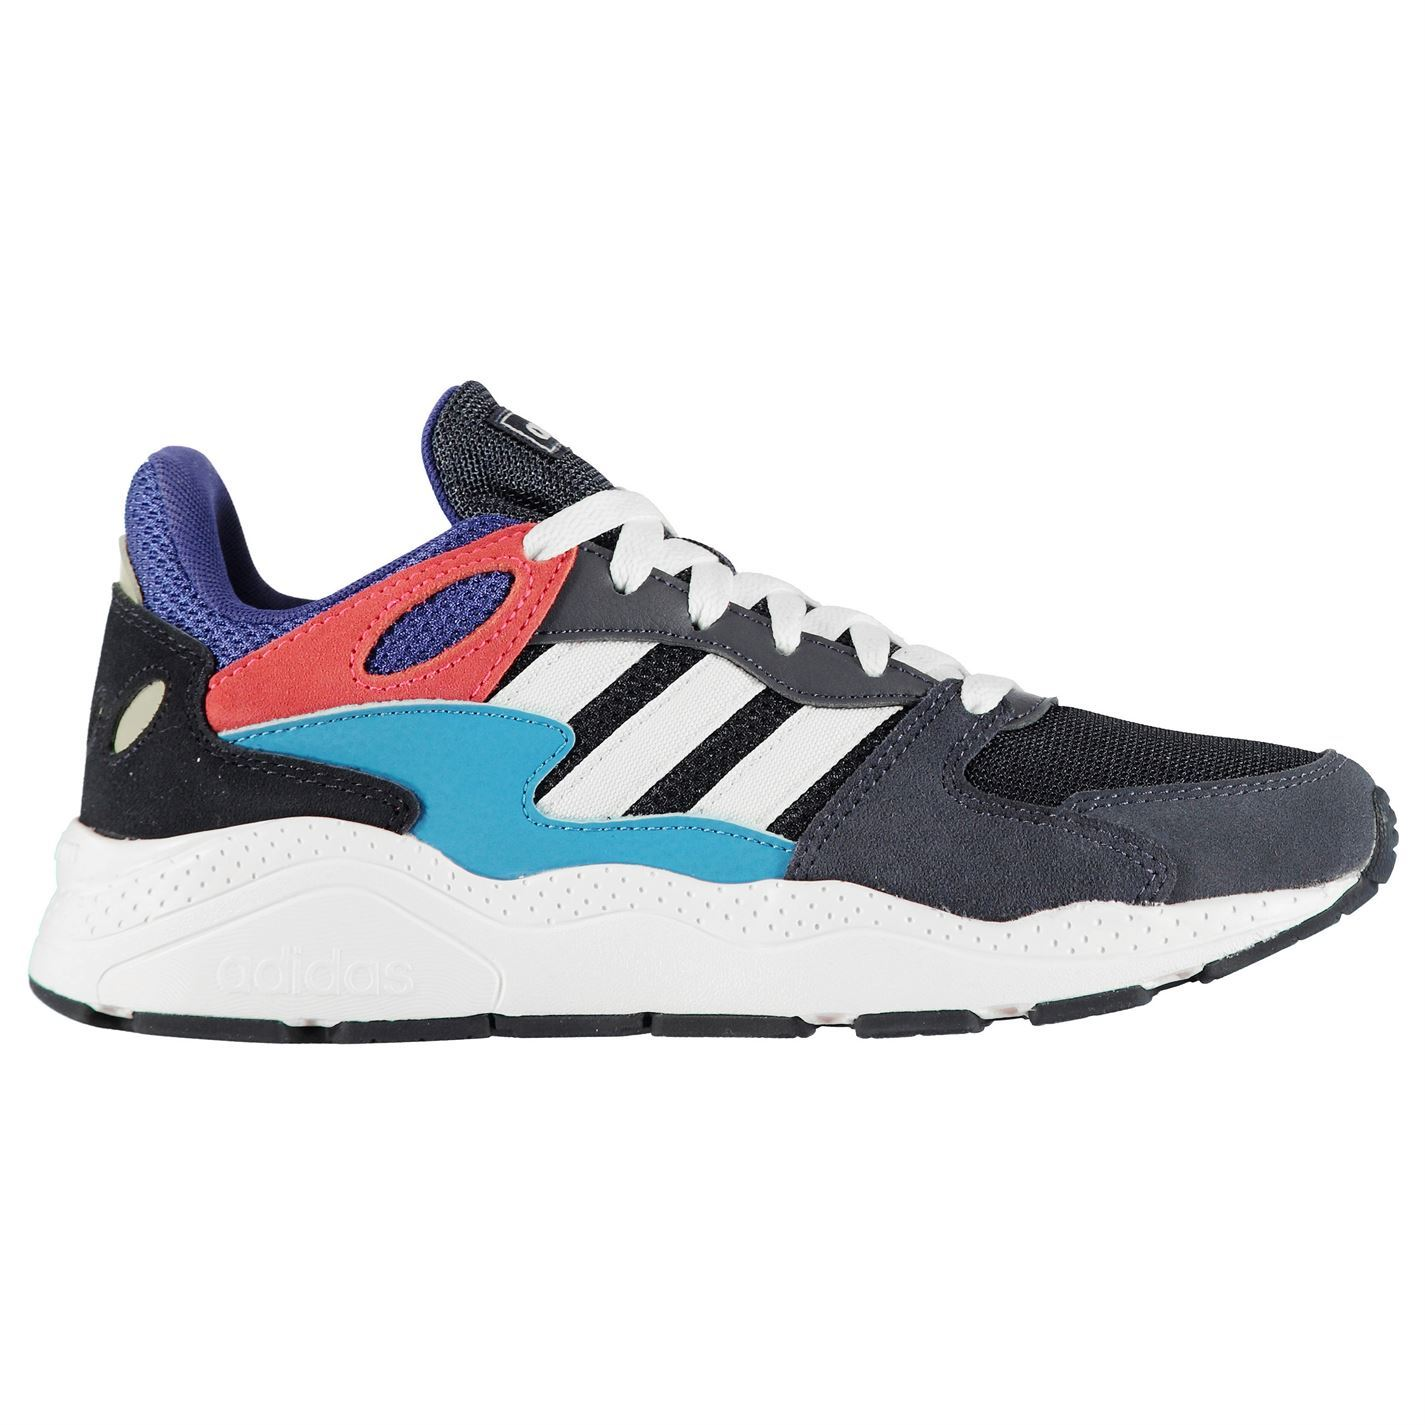 Adidas-Crazychaos-Baskets-Homme-Chaussures-De-Loisirs-Chaussures-Baskets miniature 21